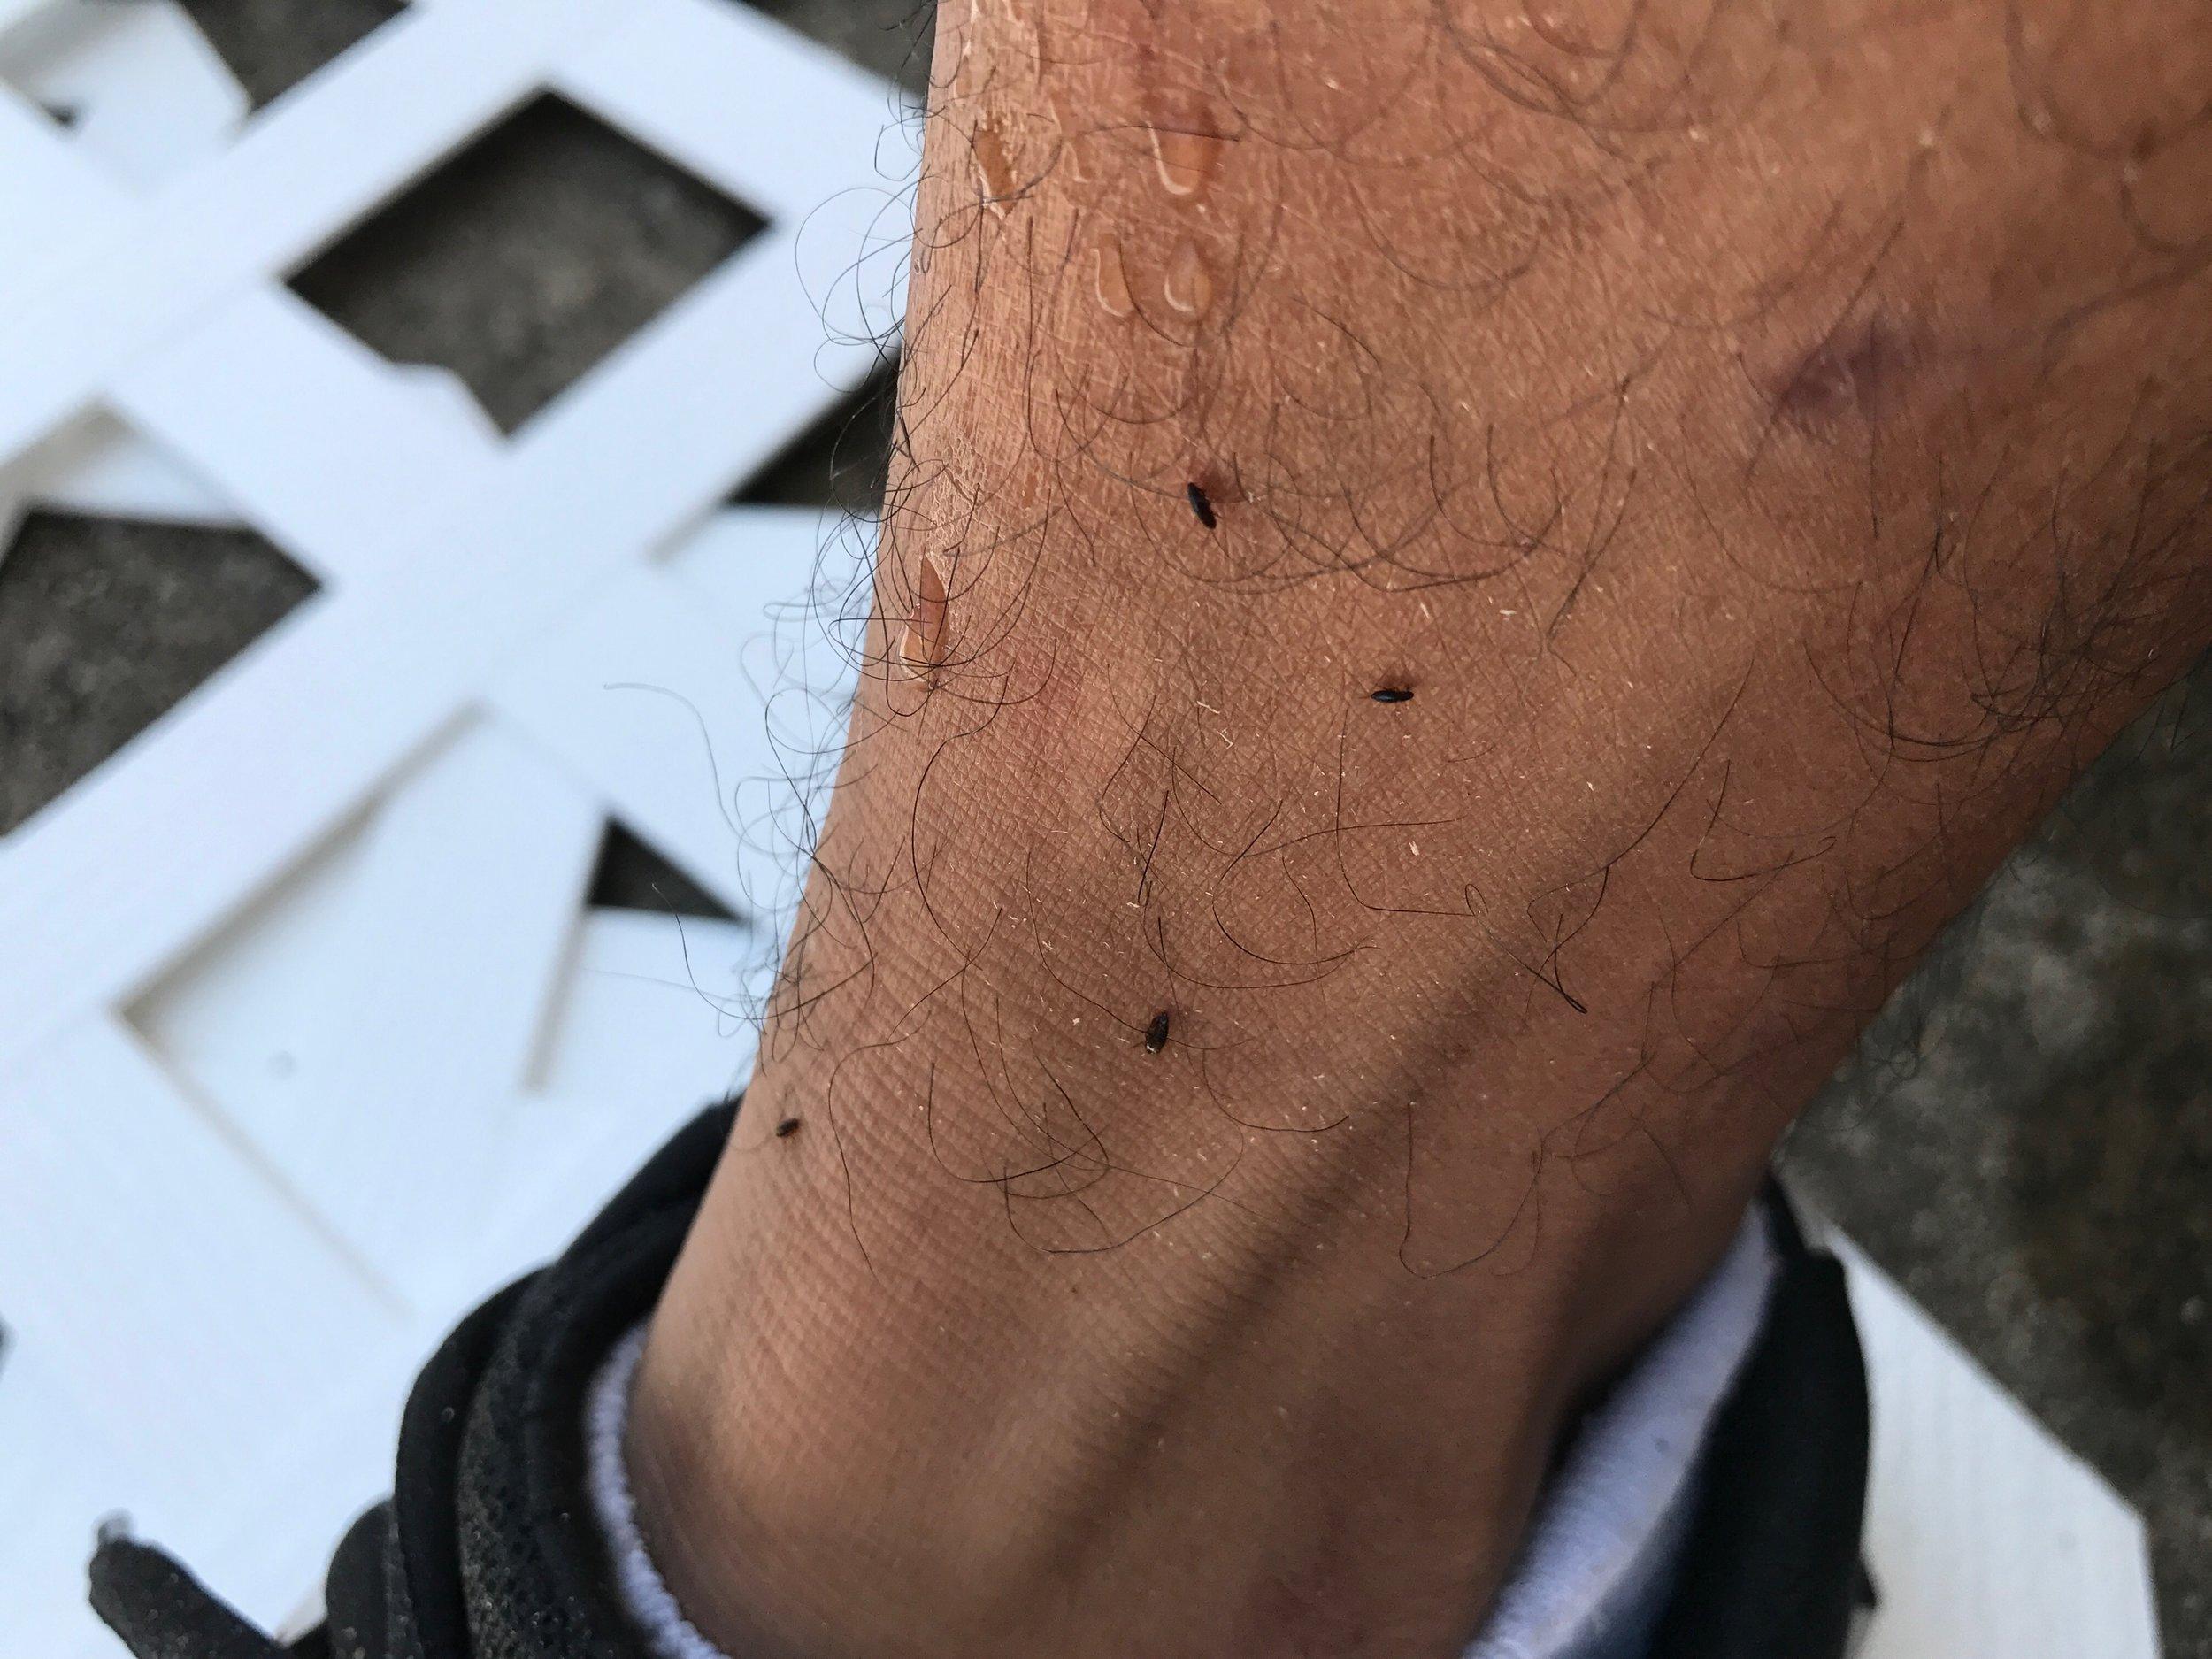 Fleas on leg